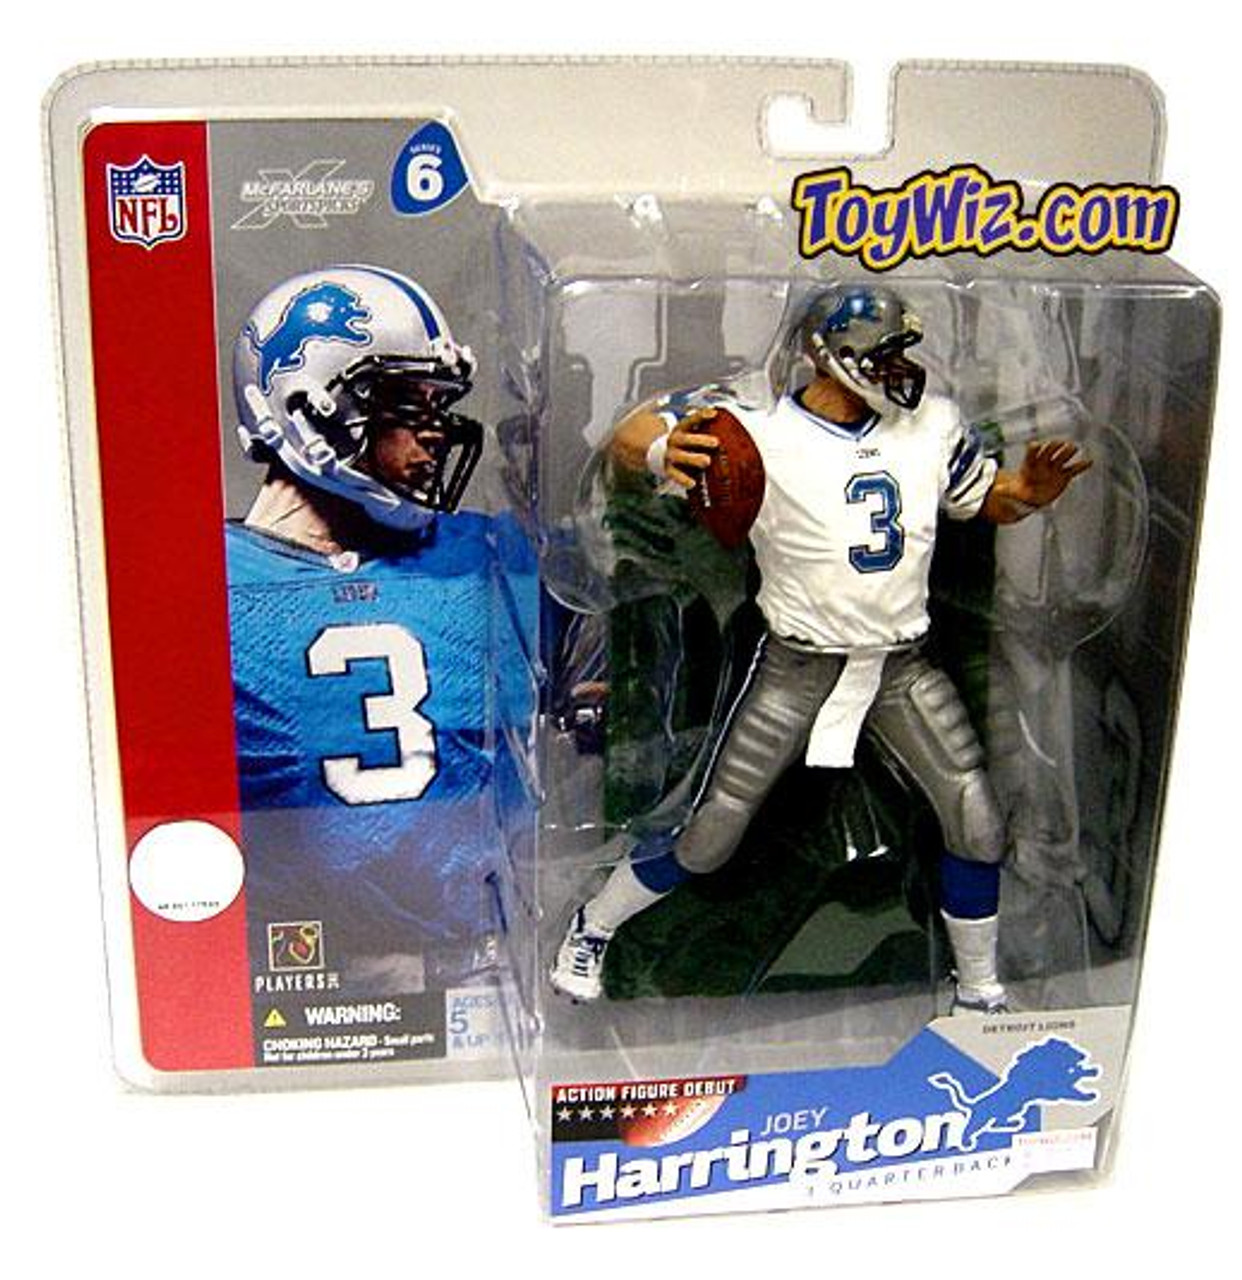 McFarlane Toys NFL Detroit Lions Sports Picks Series 6 Joey Harrington Action Figure [White Jersey Variant]